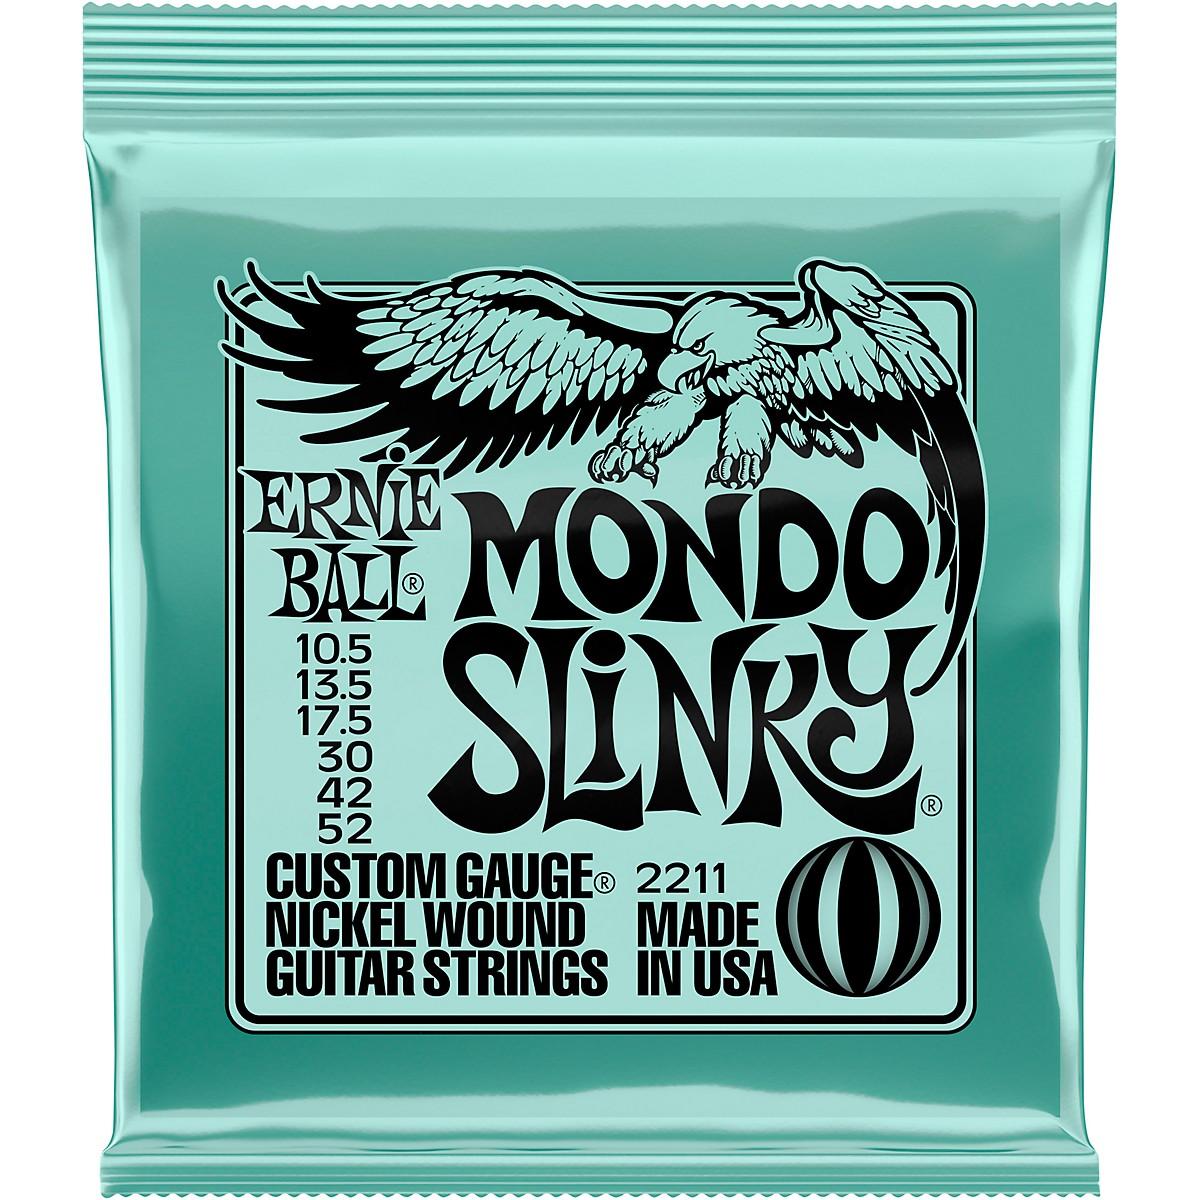 Ernie Ball Mondo Slinky 2211 (10.5-52) Nickel Wound Electric Guitar Strings